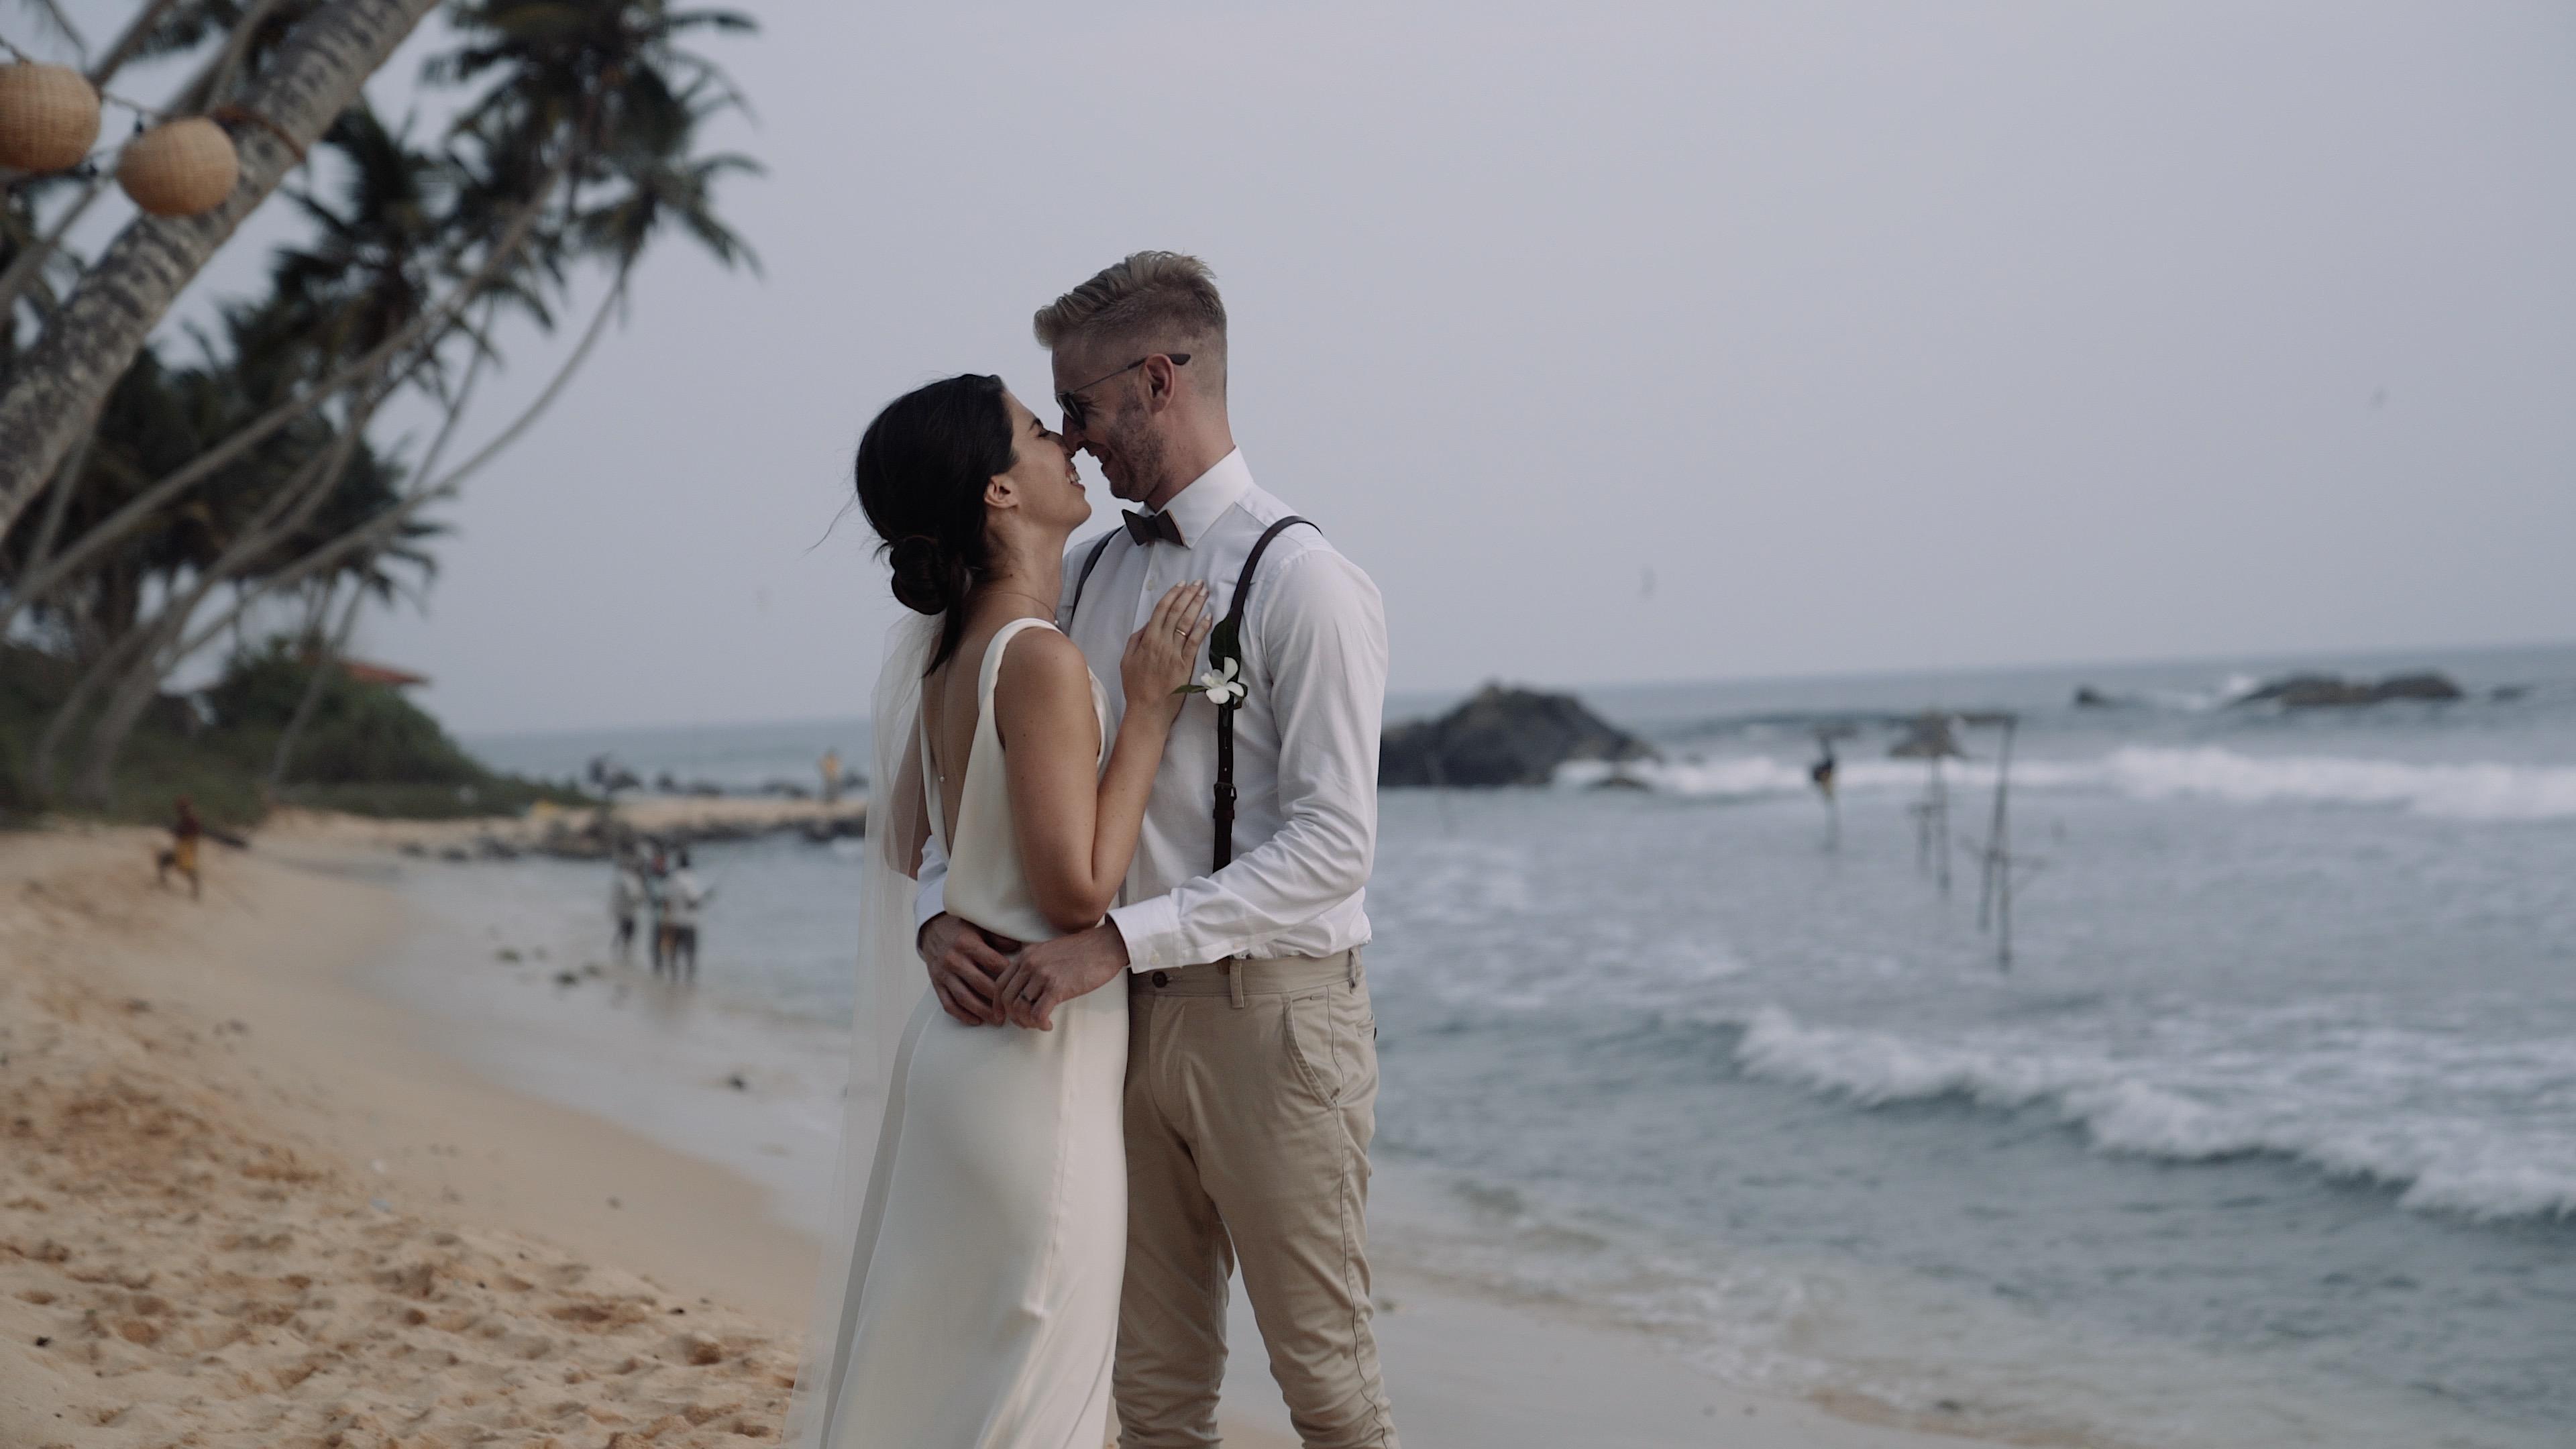 Hannah + Liam | Sri Lanka, Sri Lanka | ambalama Villa